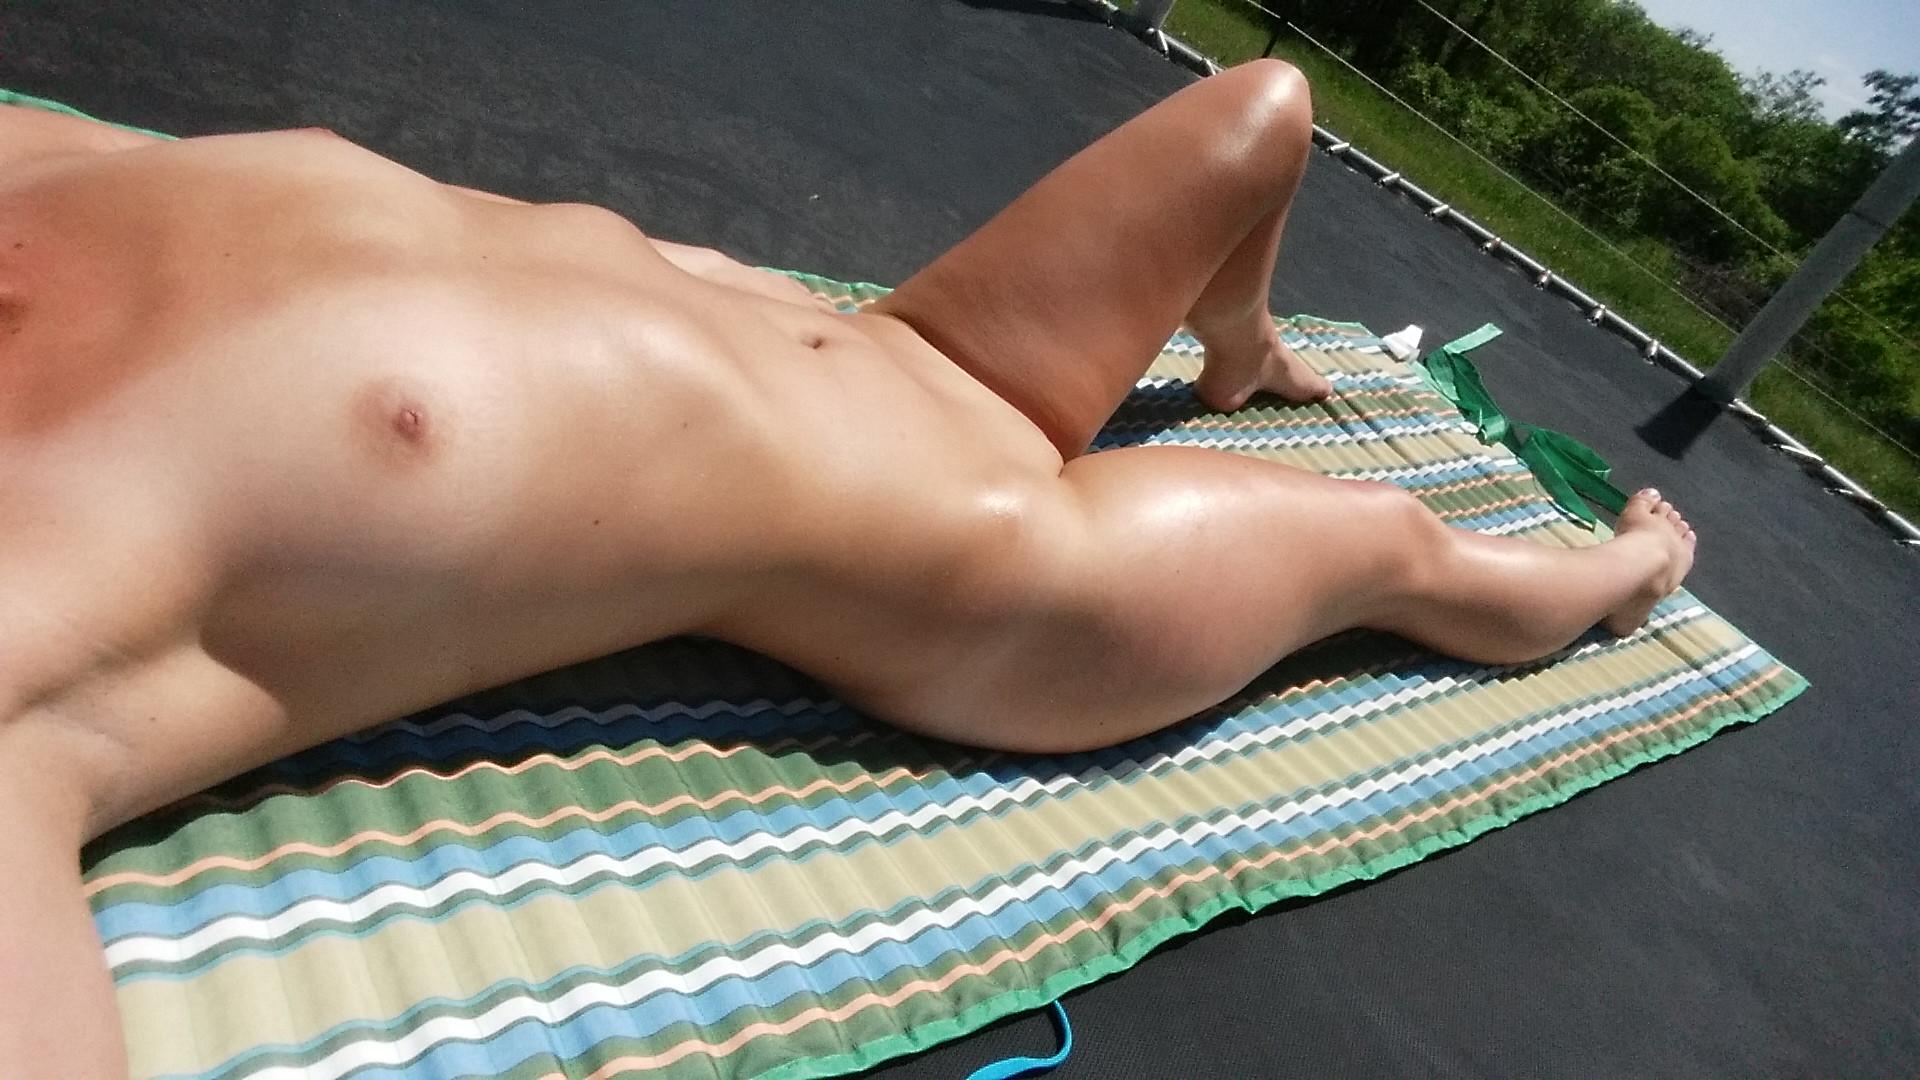 Nude sun tanning girls a beach spy cam